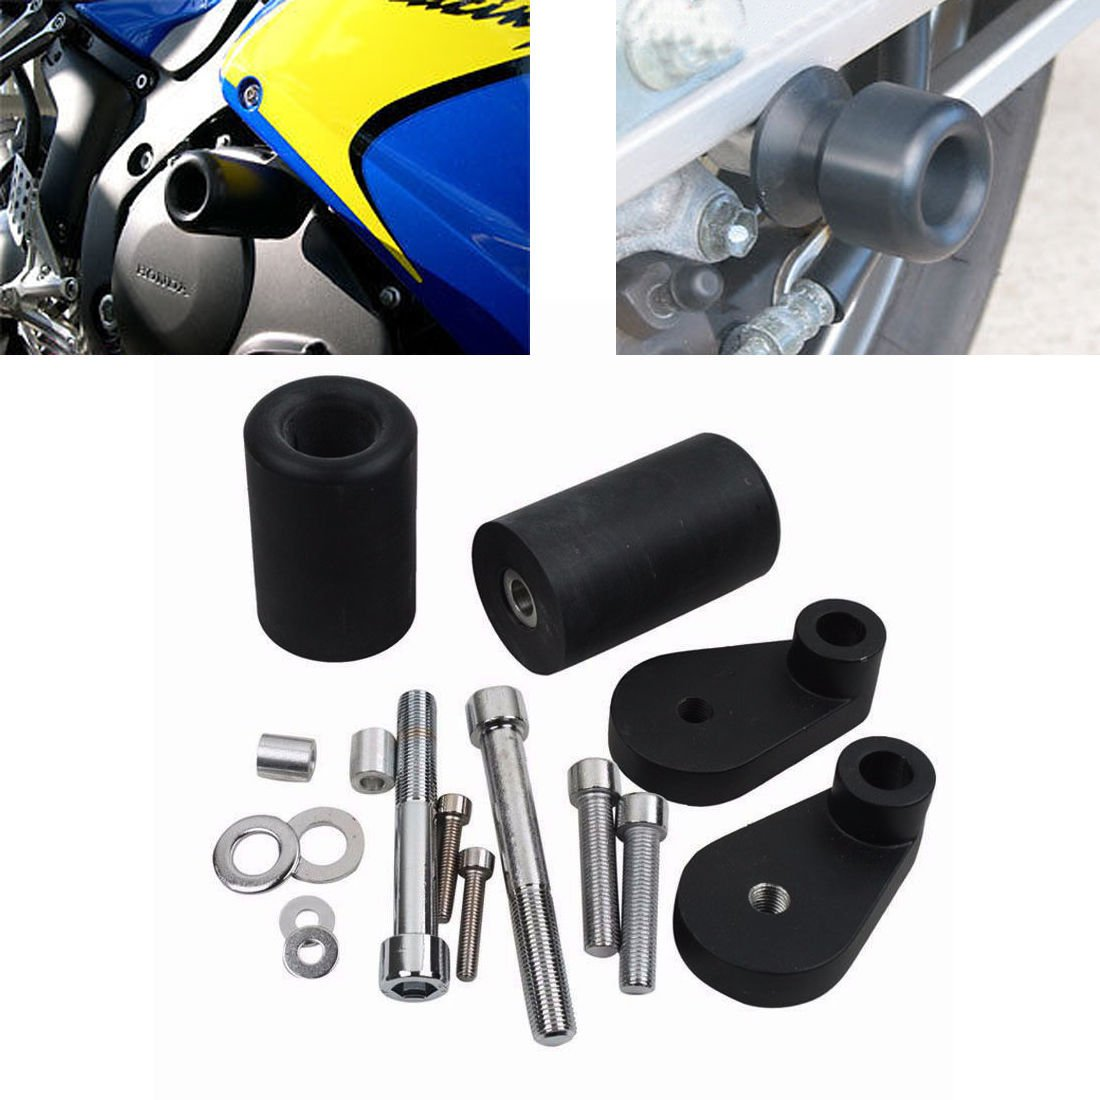 TJMOTO Black Frame Slider Engine Bodywork Fairing Crash Fall Protector For Motorcycles 1991 1990 1993 1994 1995 1996 1997 1998 Honda CBR 600 F2 F3